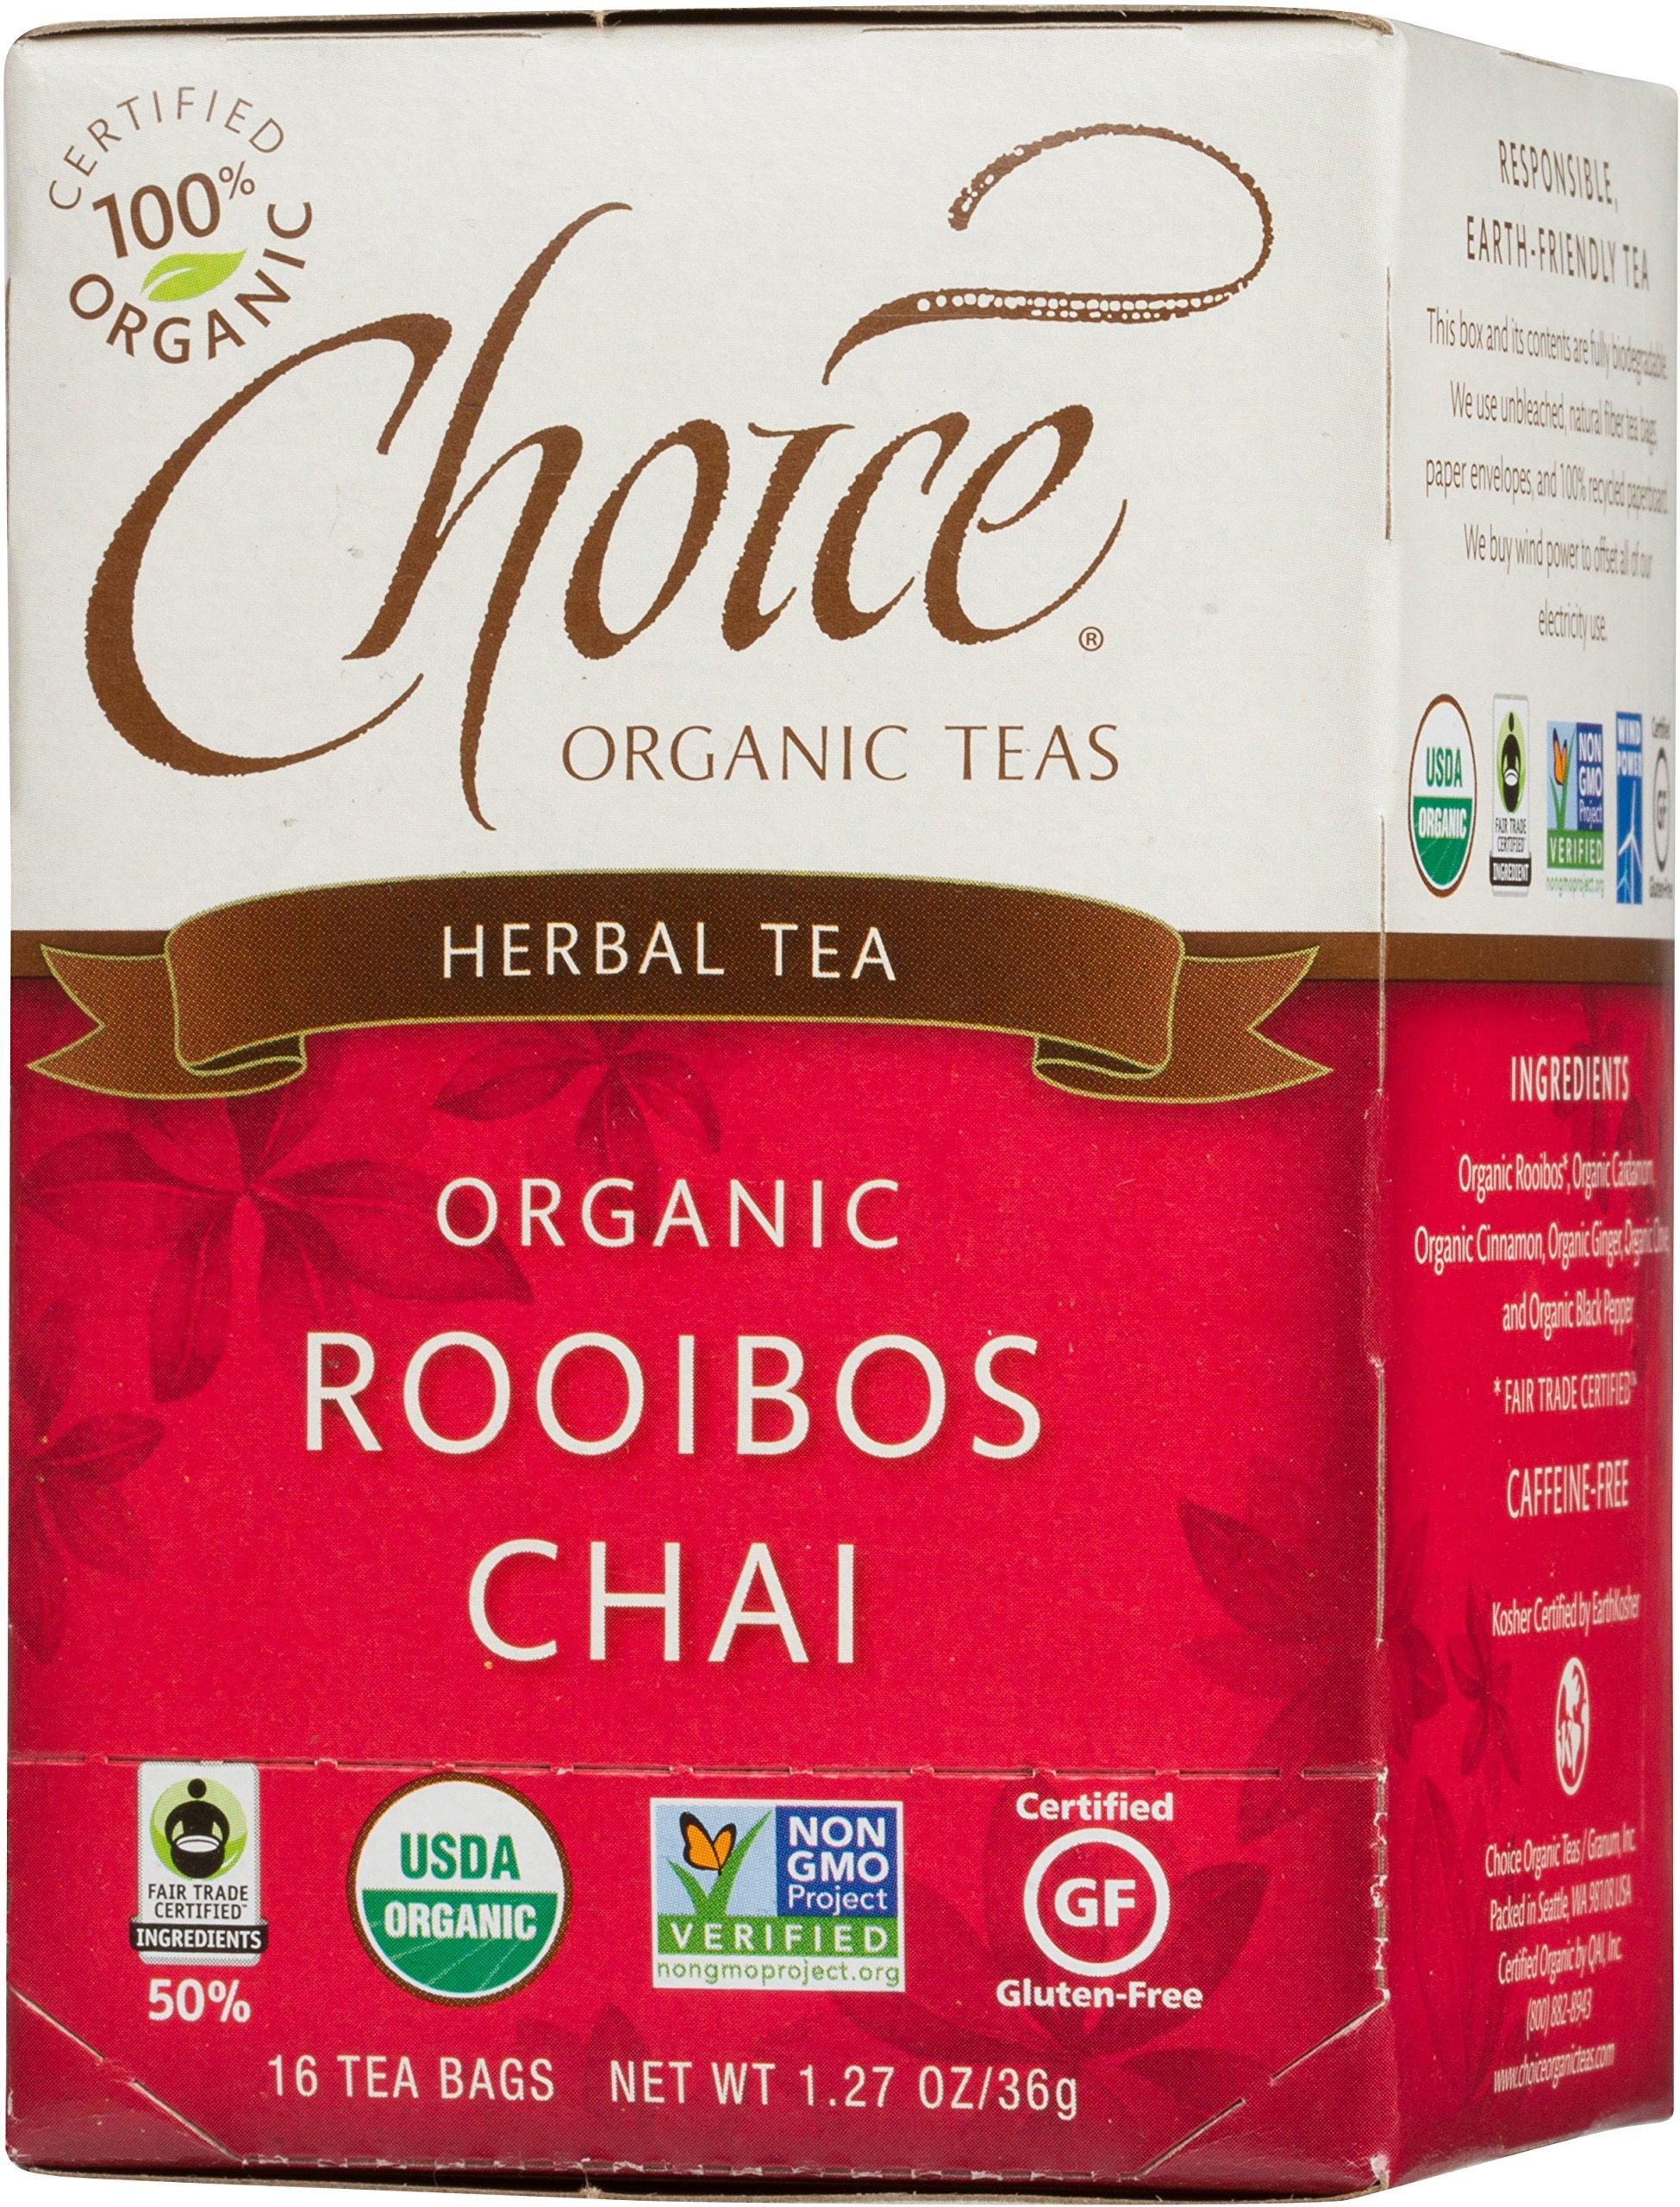 Choice Organic Teas Caffeine Free Herbal Tea, Rooibos Chai, 16 Count, Pack of 6